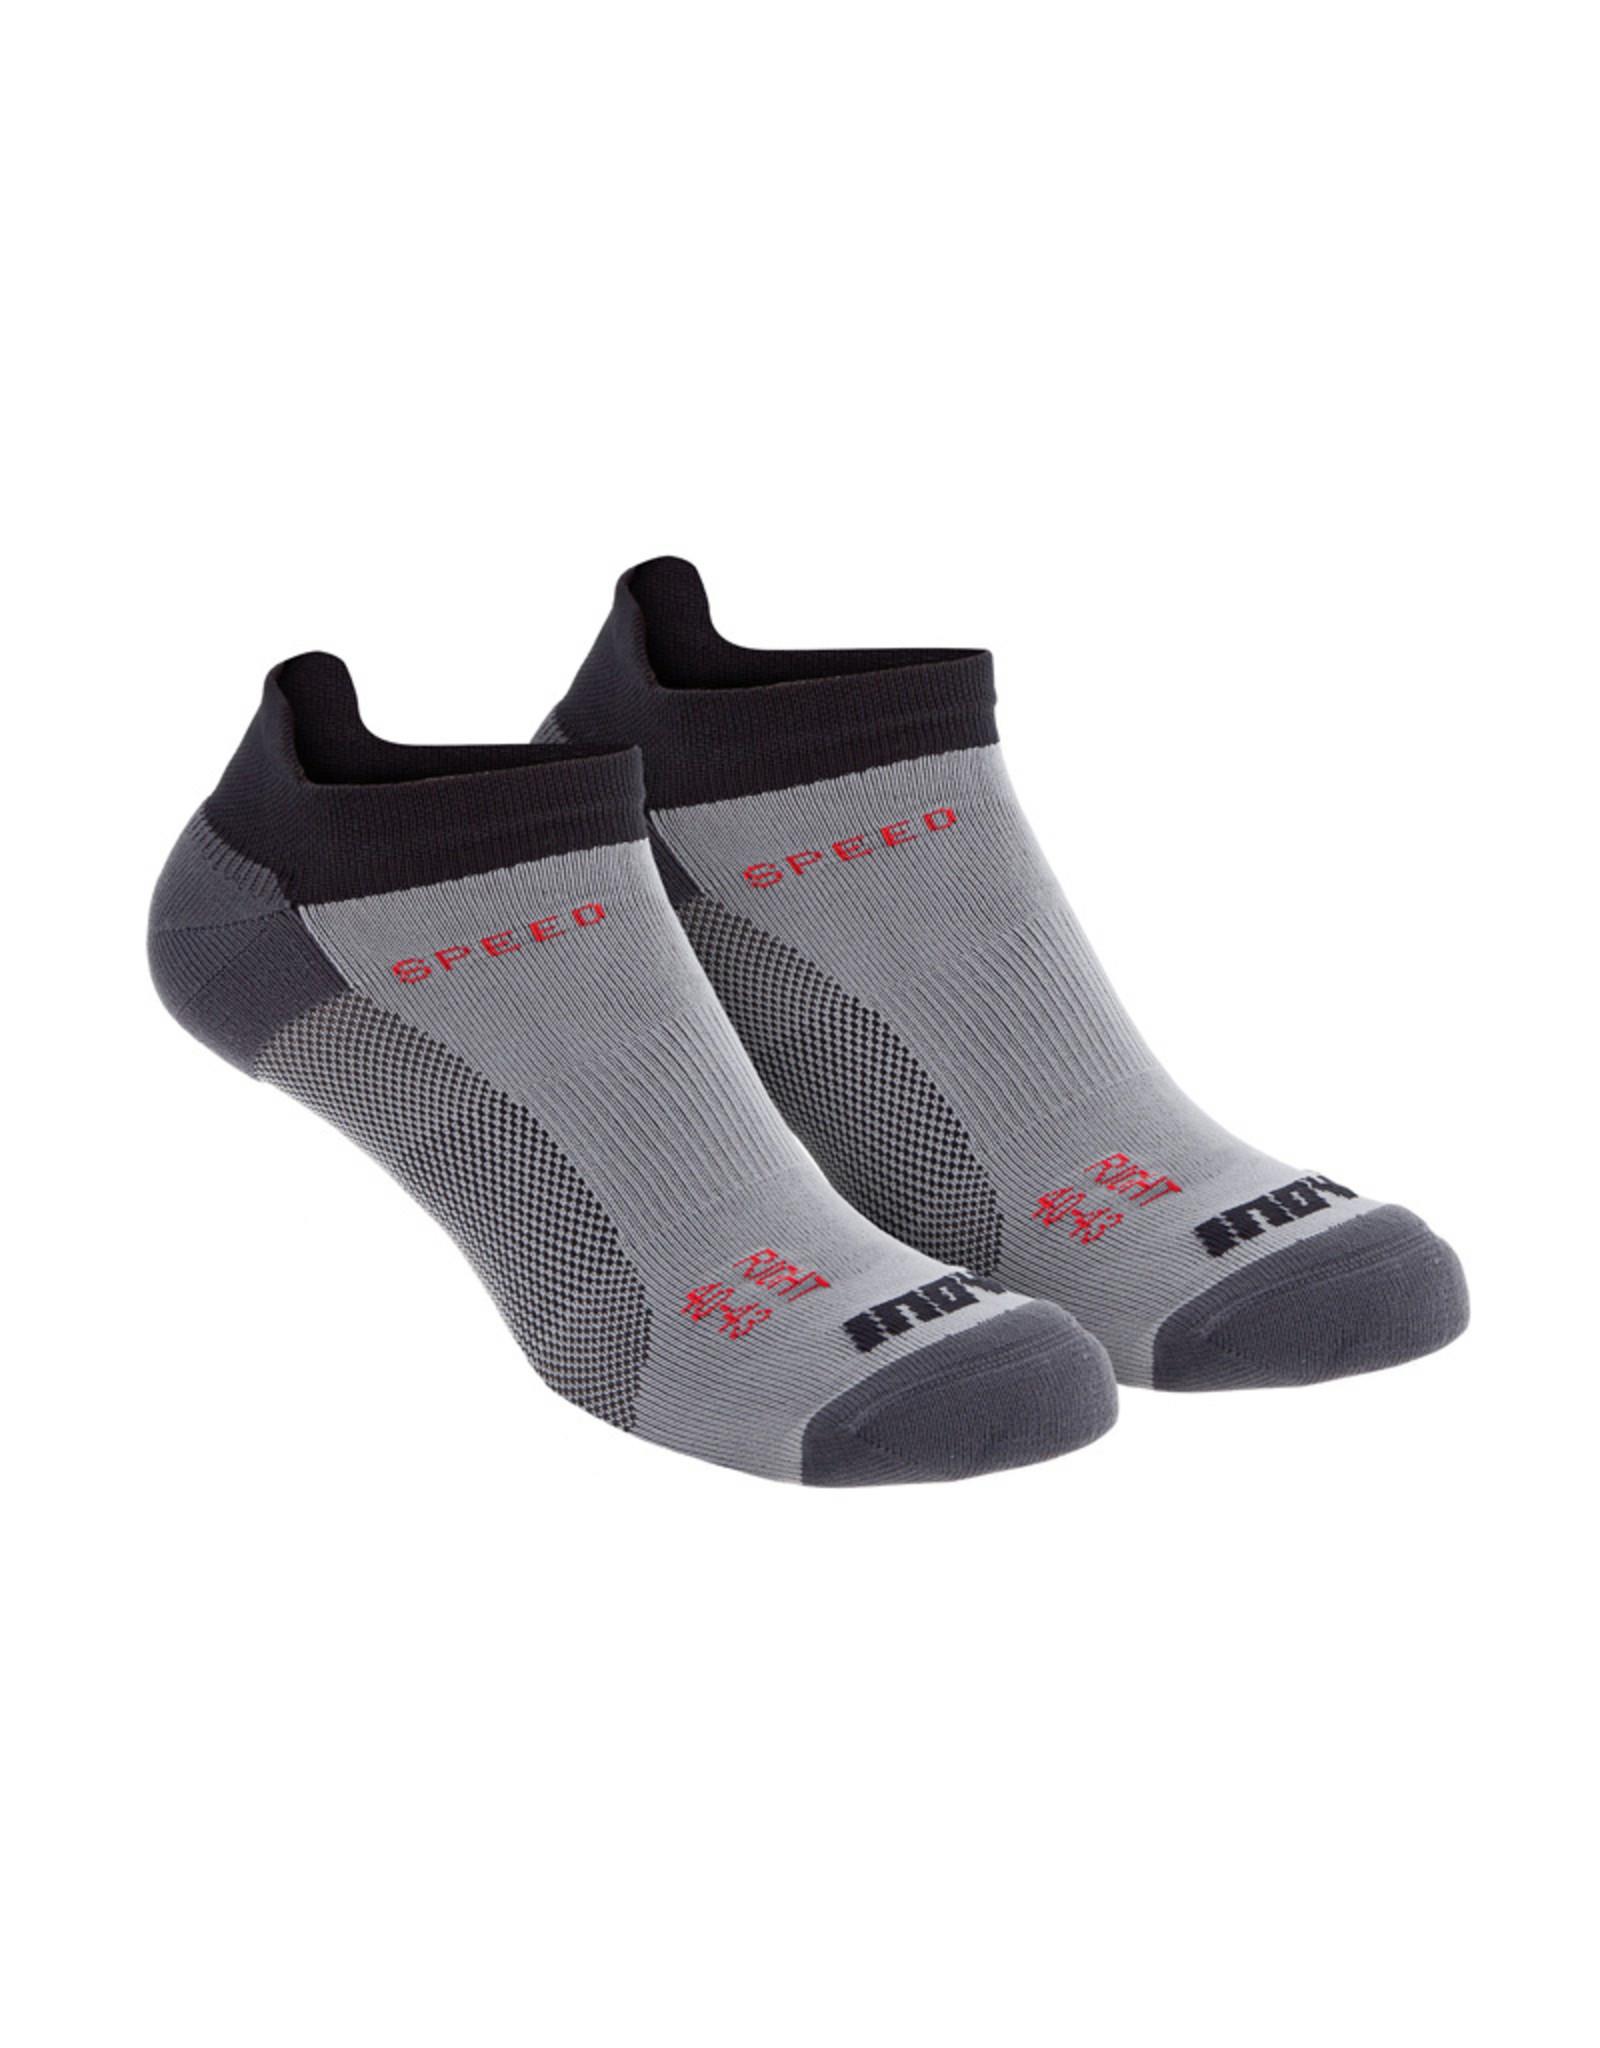 Inov-8 Speed Sock Chaussettes De Running Laag Deux Paires - Noir